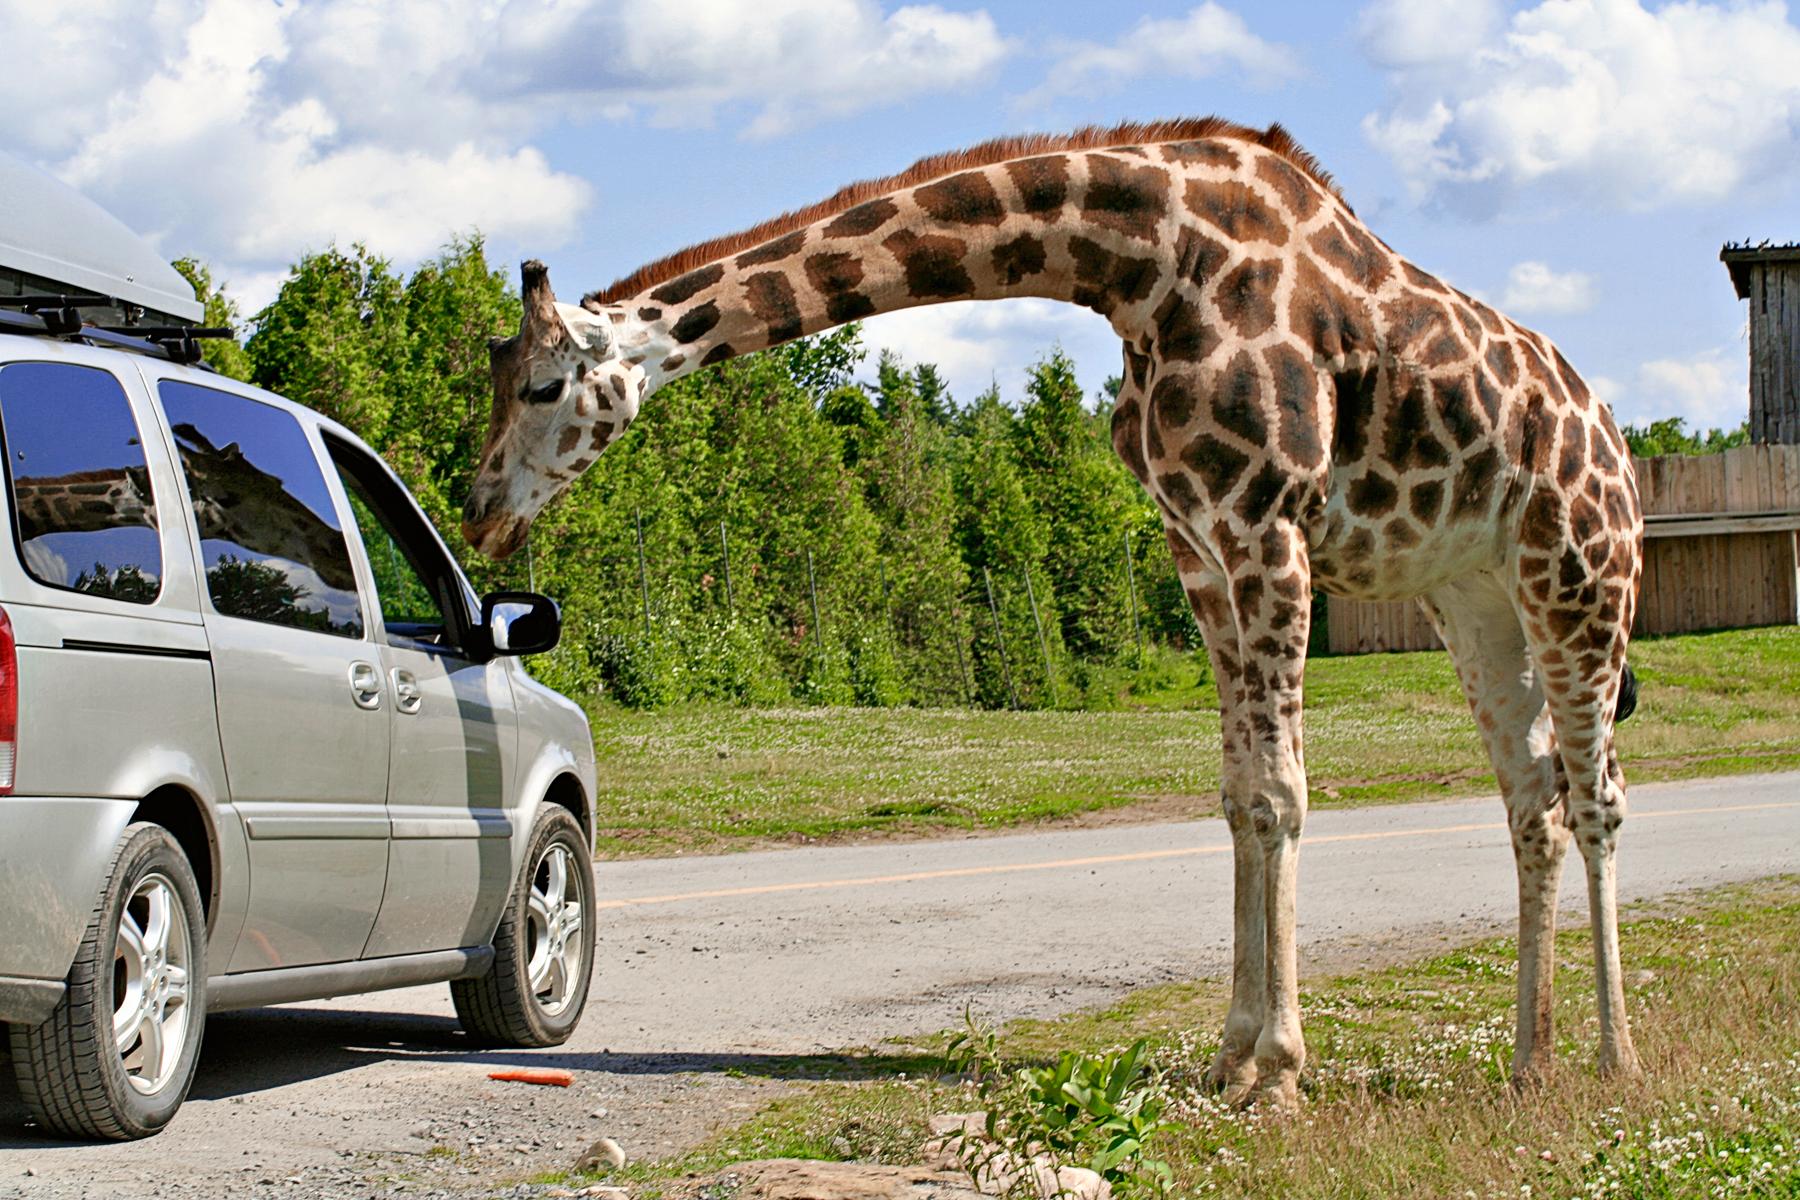 Gentle Giraffe, Animal, Maroon, Outdoor, Outdoors, HQ Photo